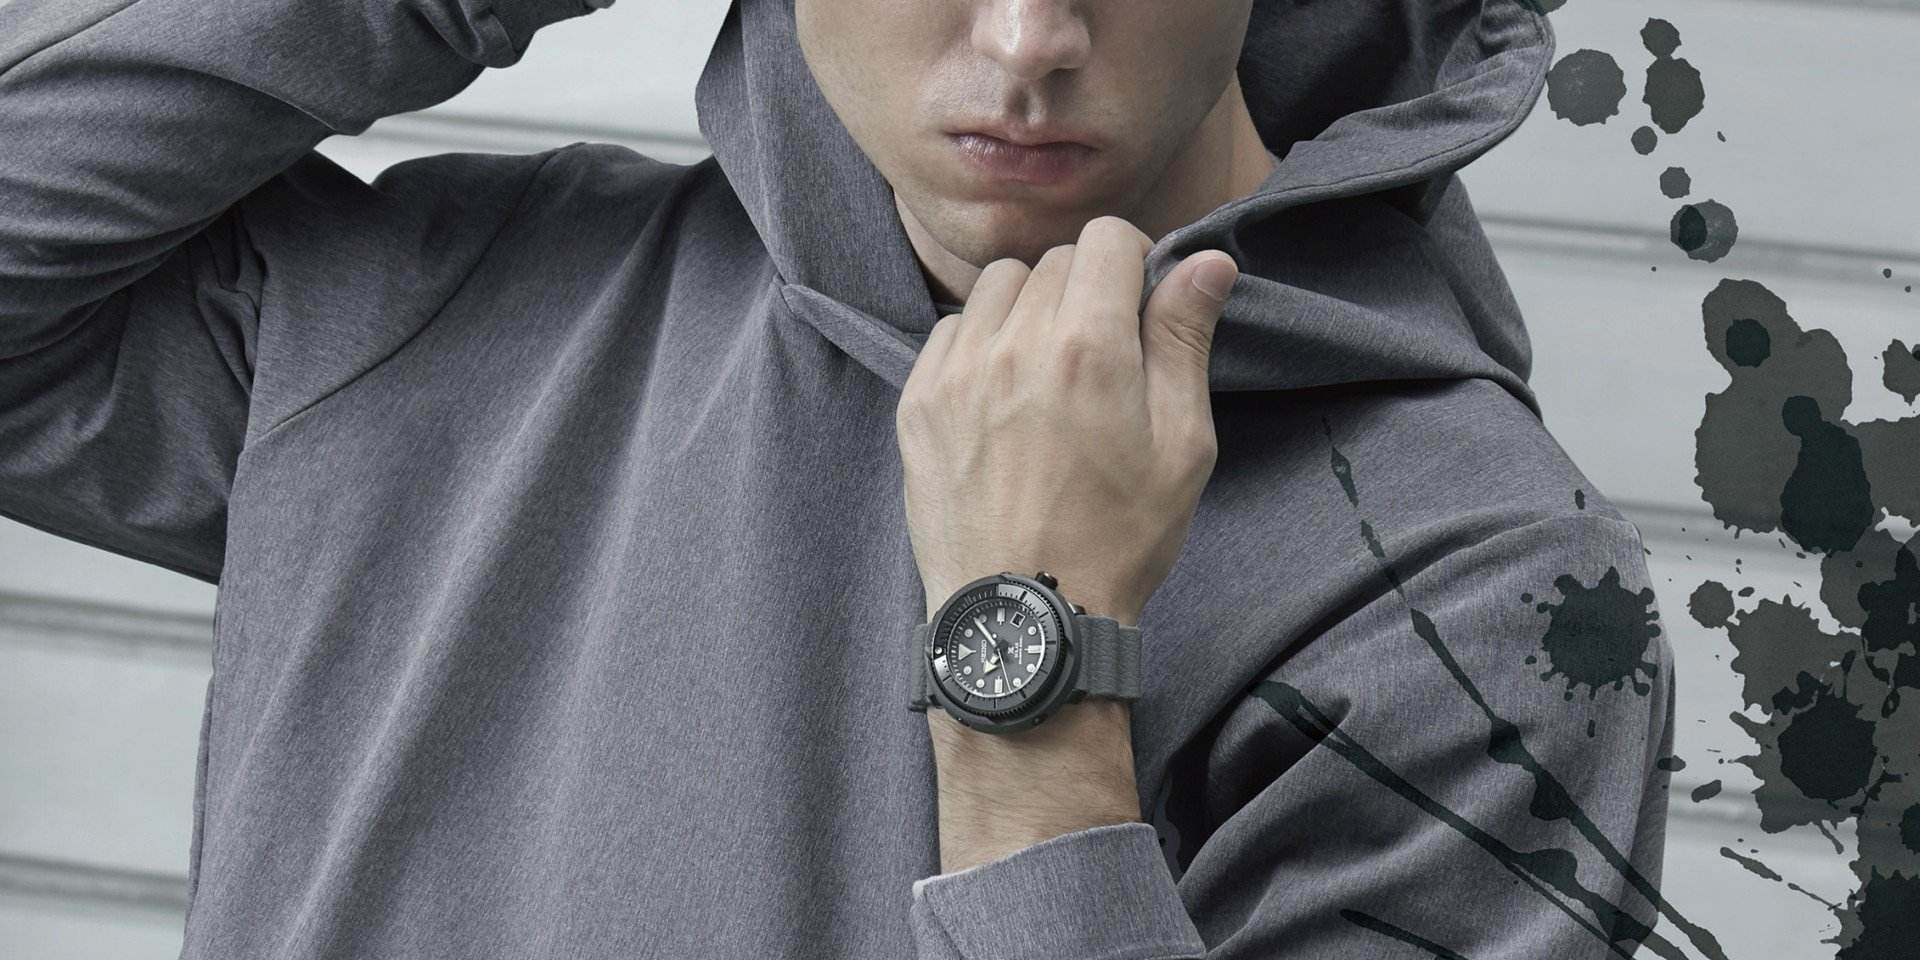 Seiko Prospex全新系列「Street Series」為潛水錶注入街頭元素,引領秋冬時尚風潮